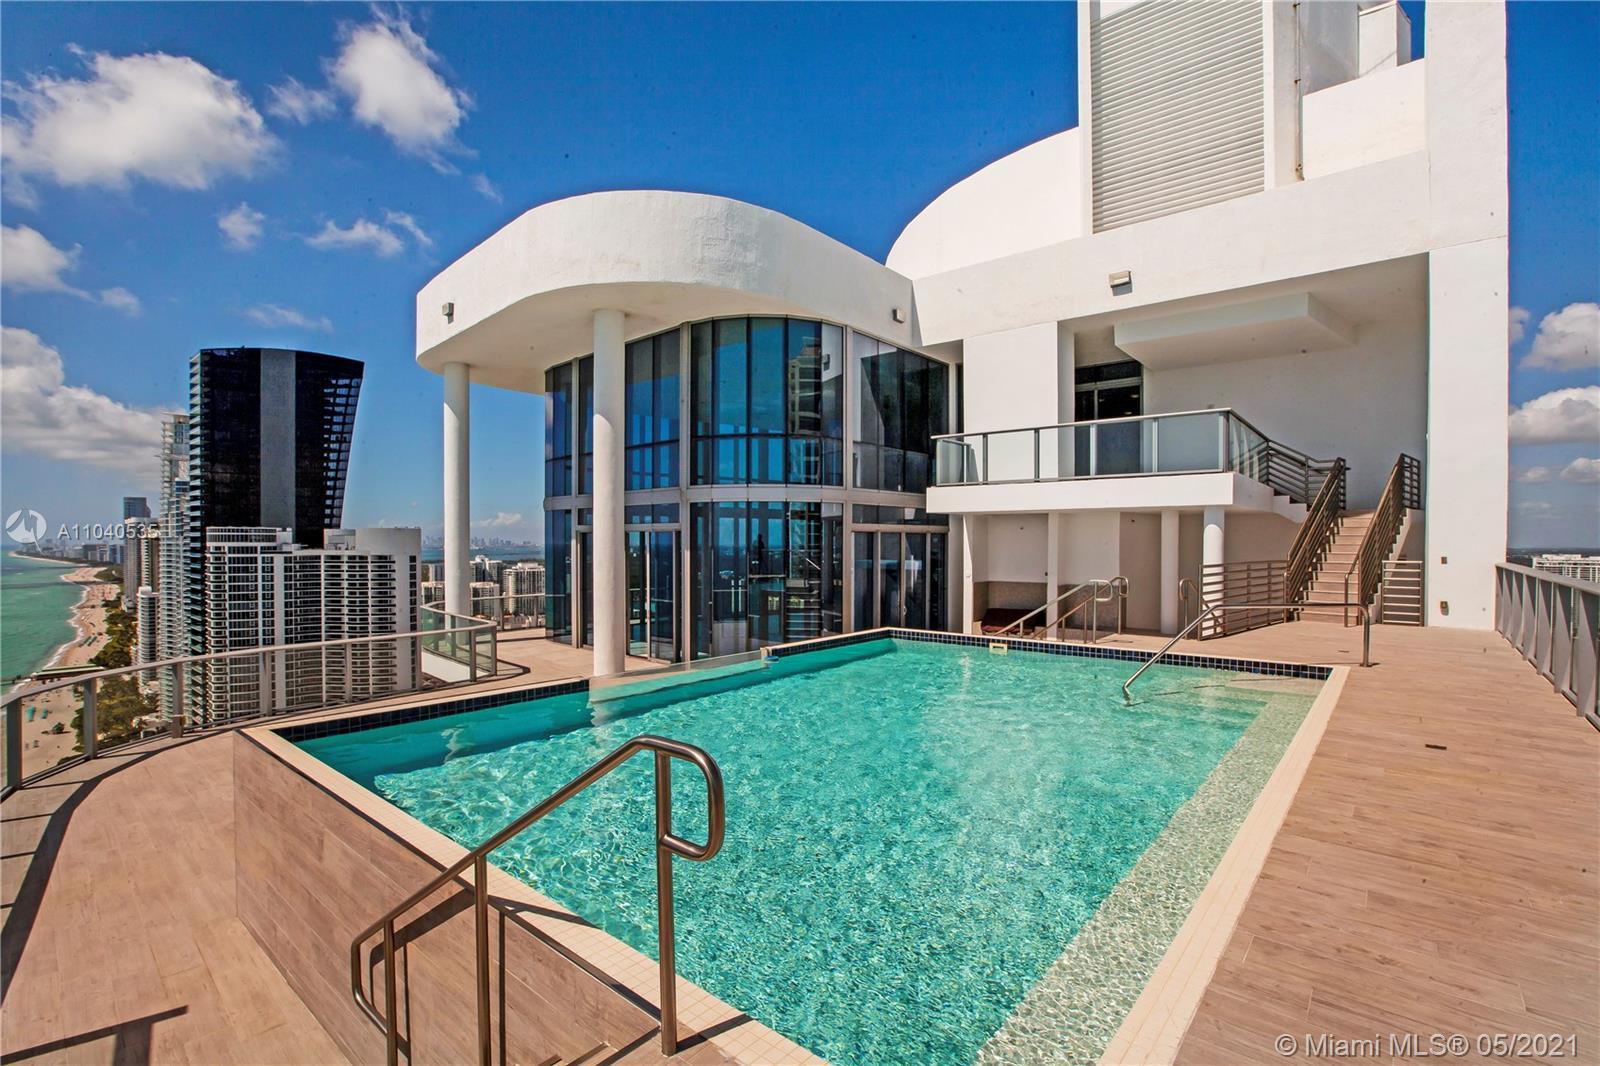 17475 Collins Ave, Unit #PH-3201 Luxury Real Estate